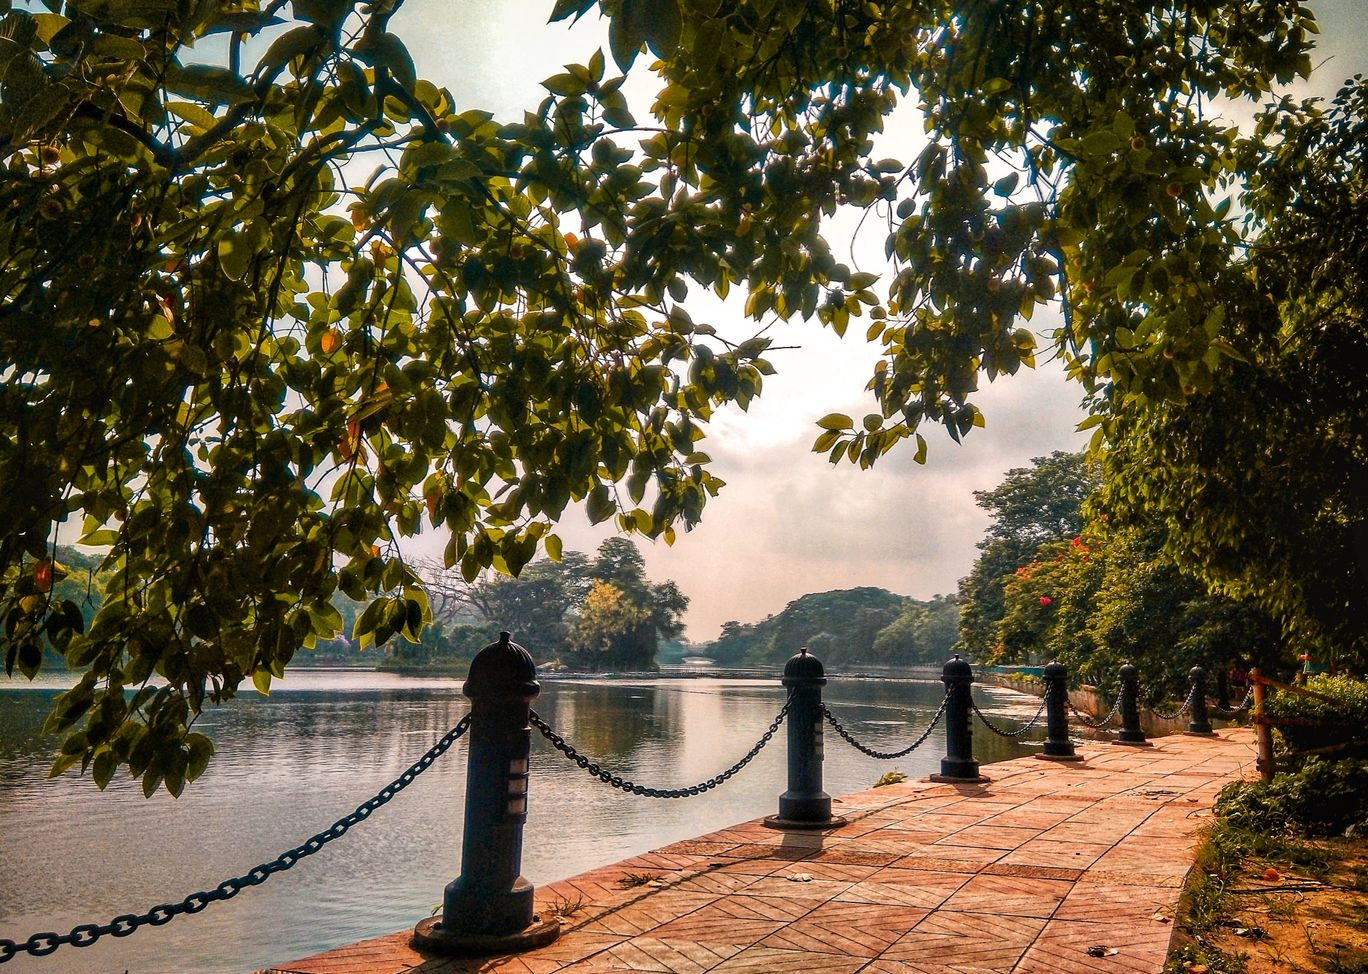 Photo of Rabindra Sarovar Lake By Subham Pattanayak